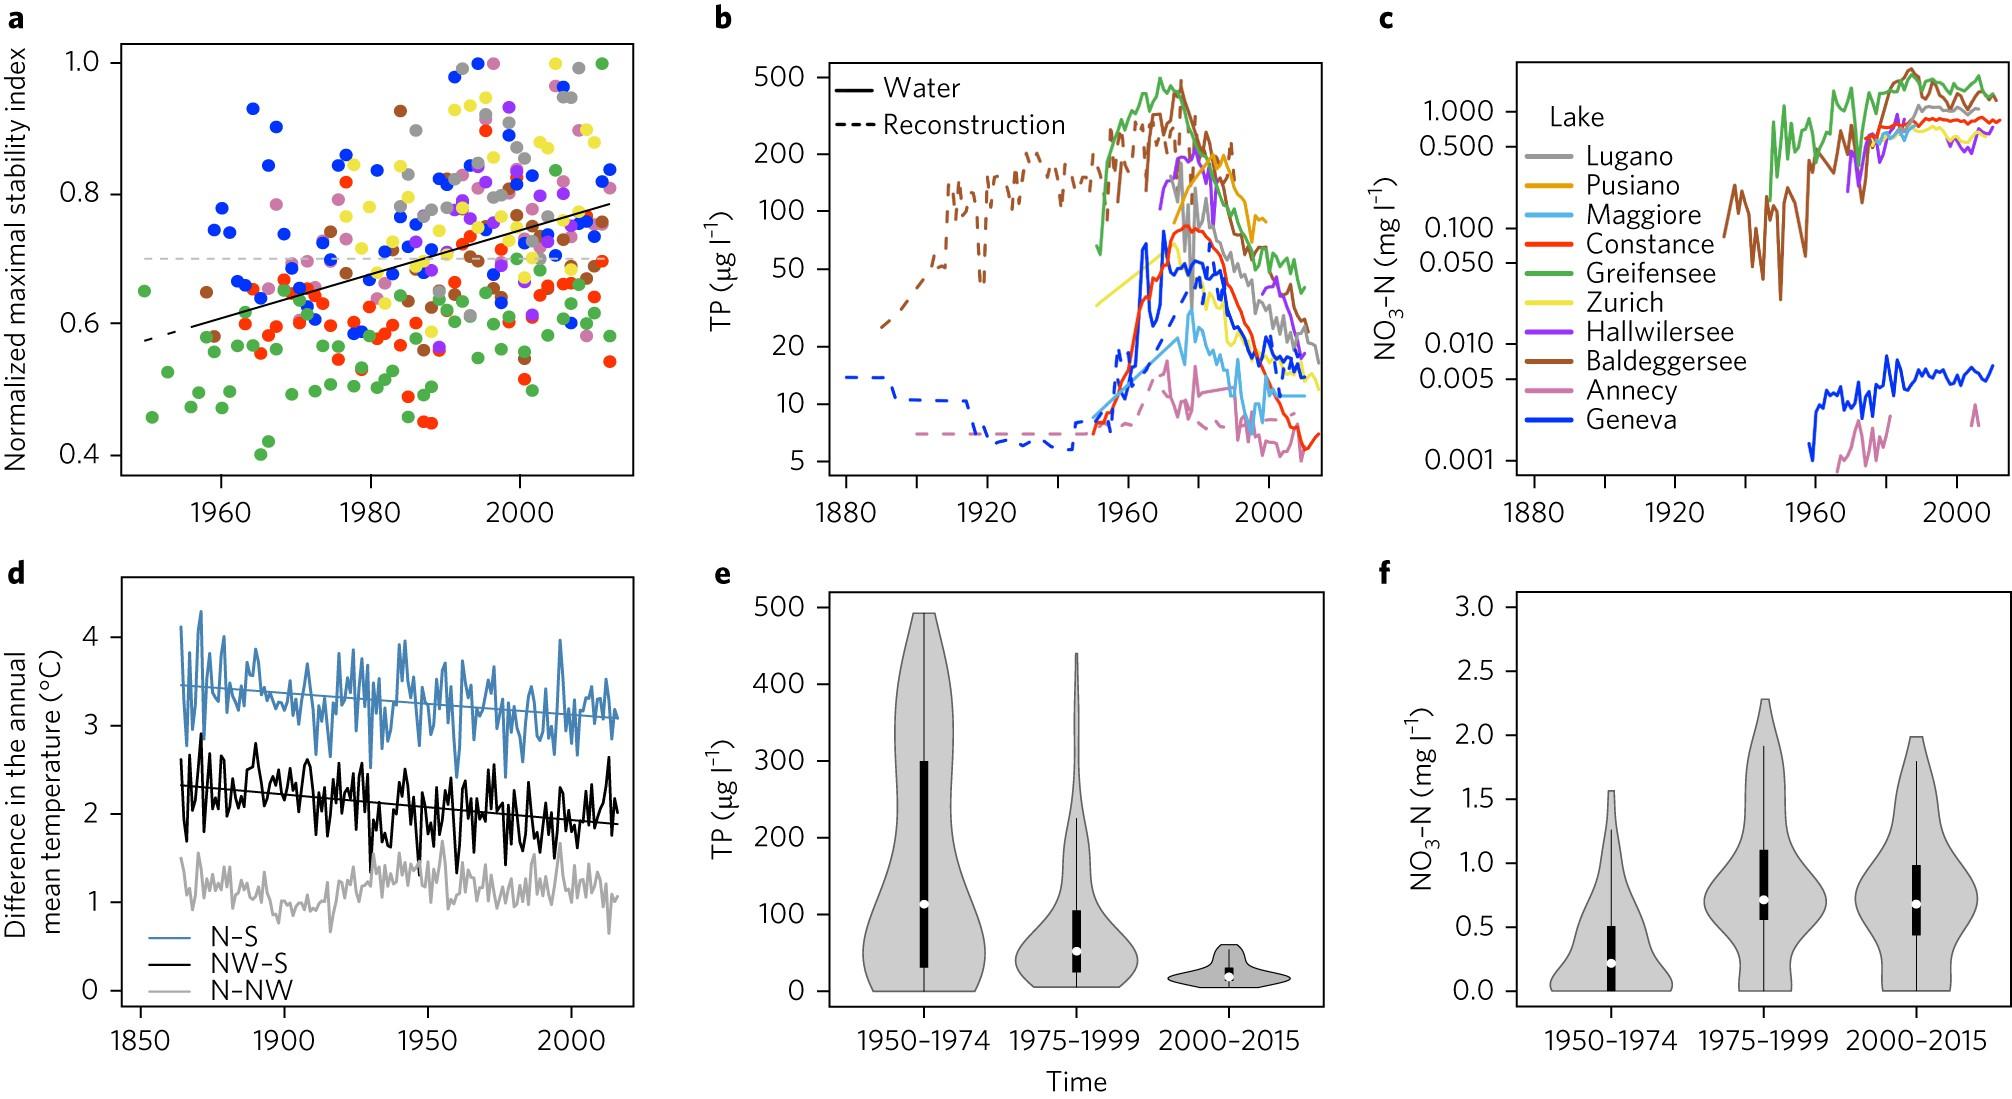 Homogenization of lake cyanobacterial communities over a century of